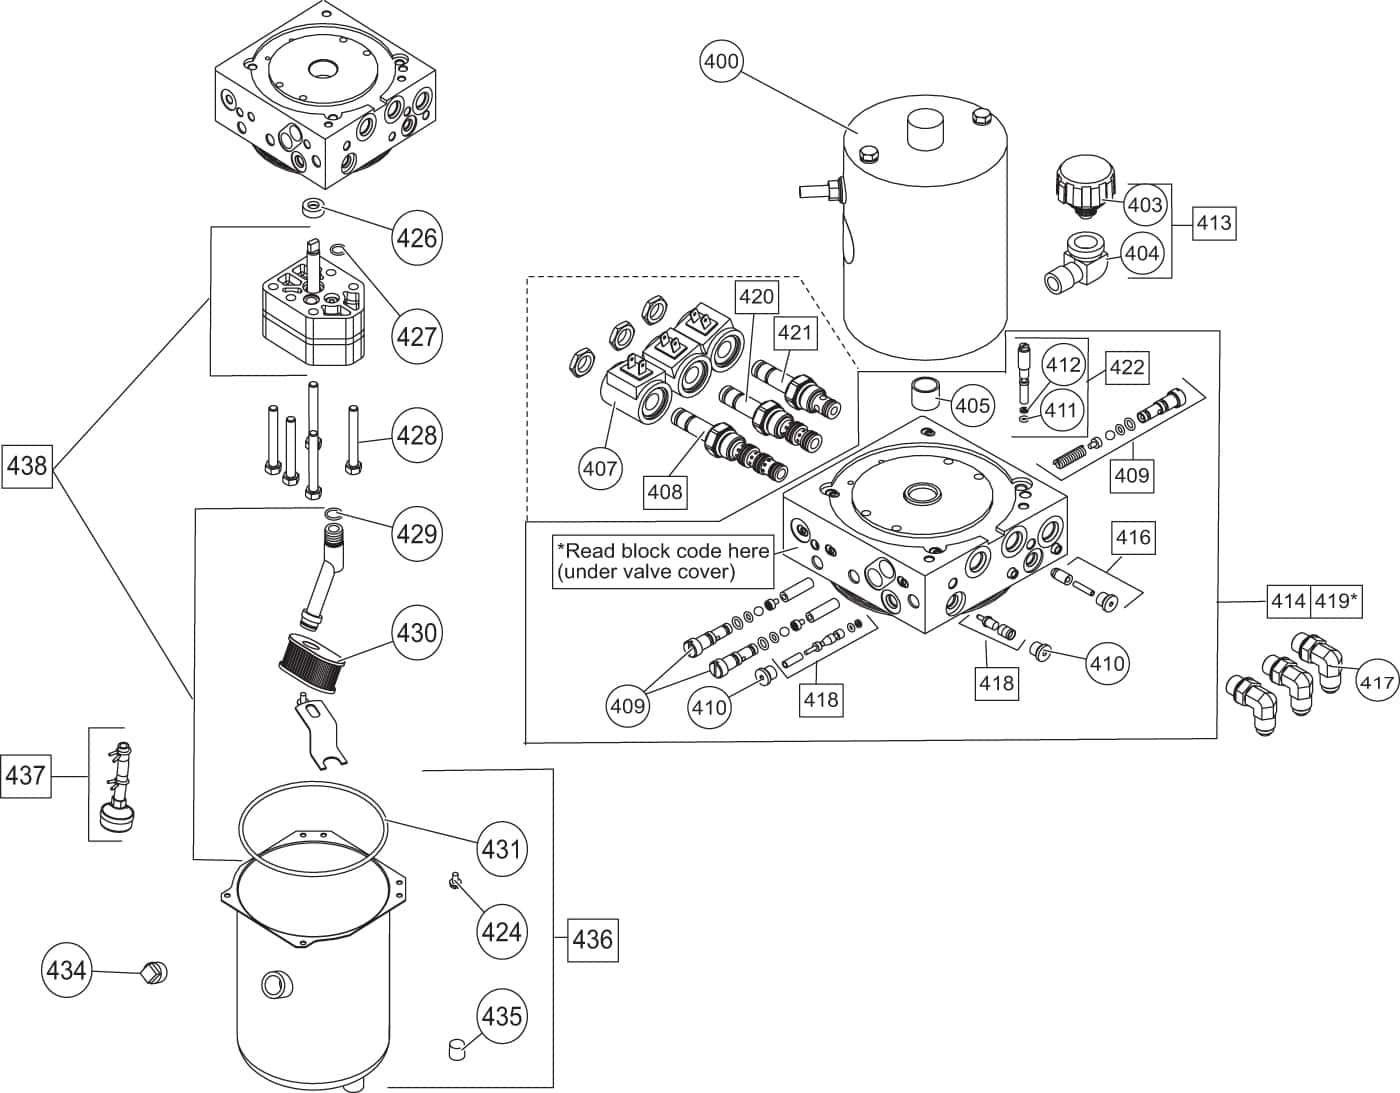 wiring diagram on hiniker snowplow controller wire harness diagram